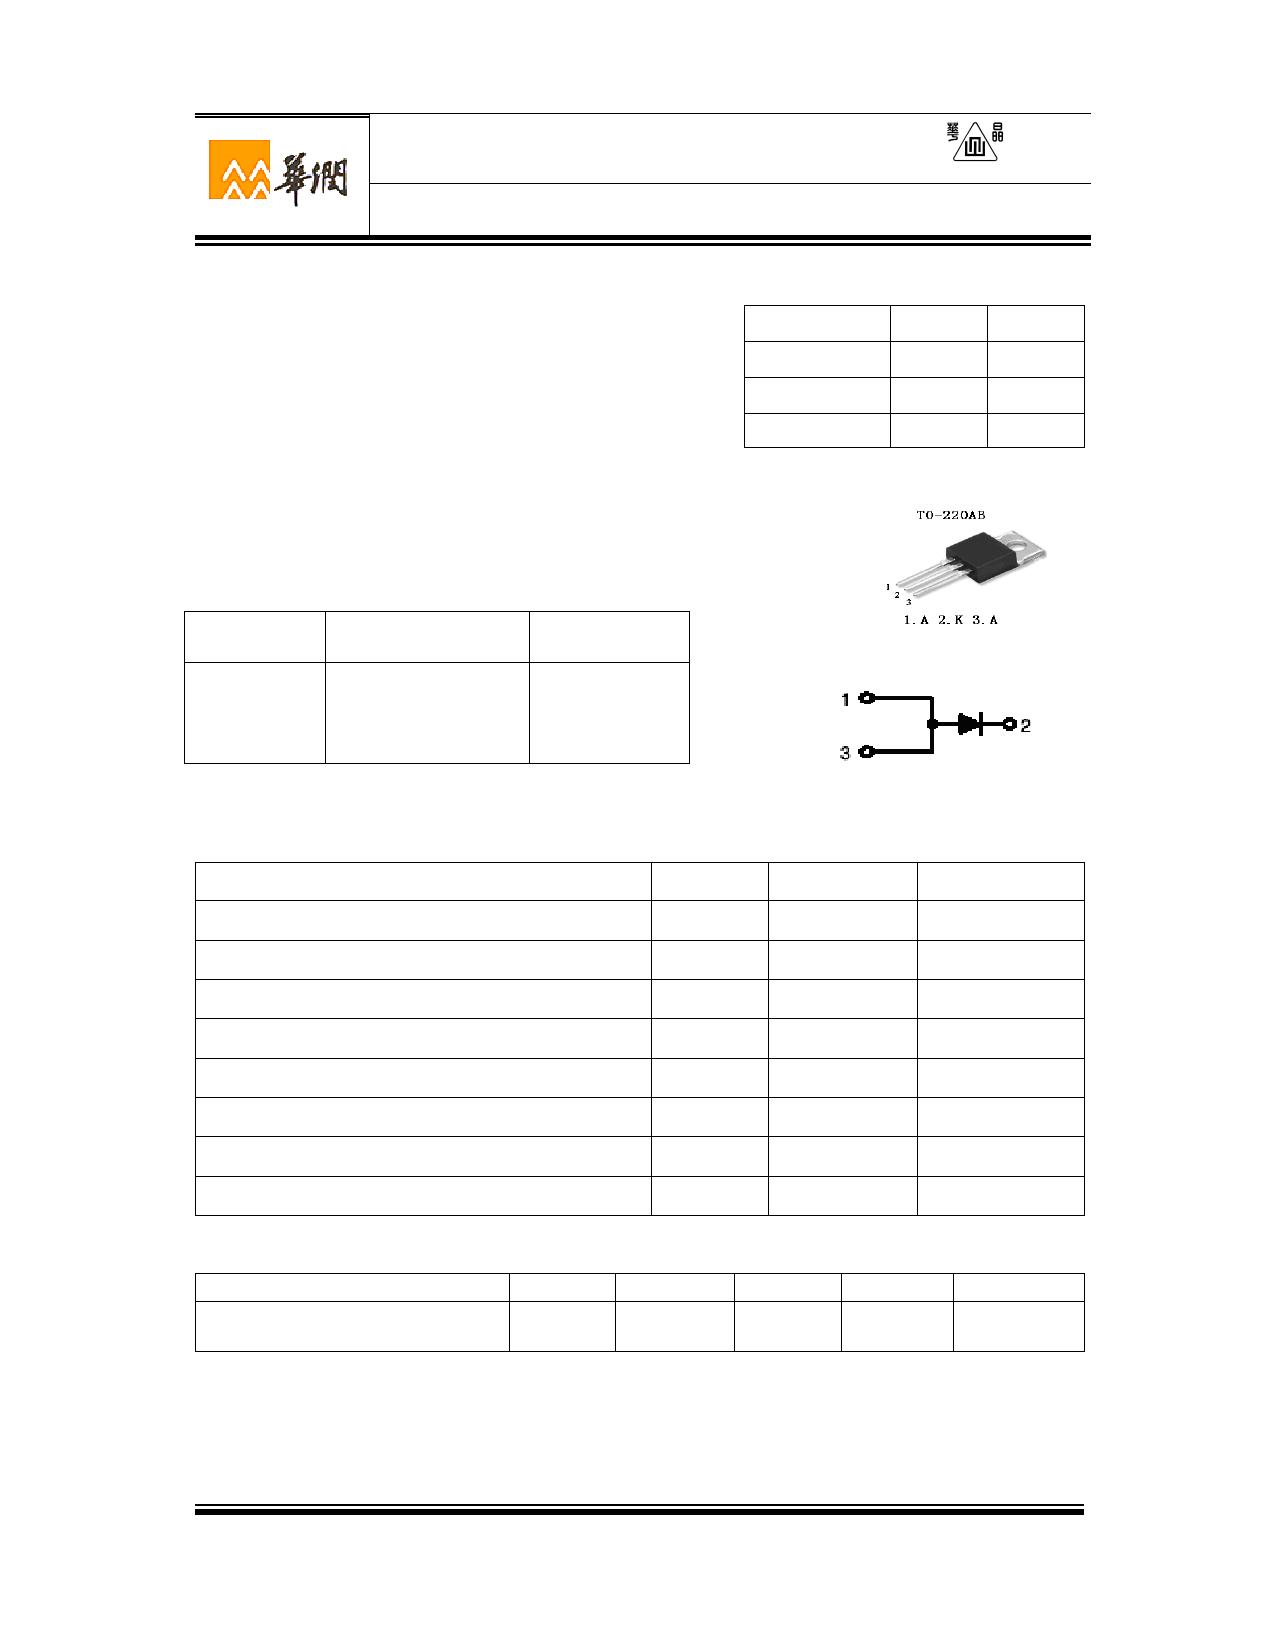 2CZ10100A8 Datasheet, 2CZ10100A8 PDF,ピン配置, 機能